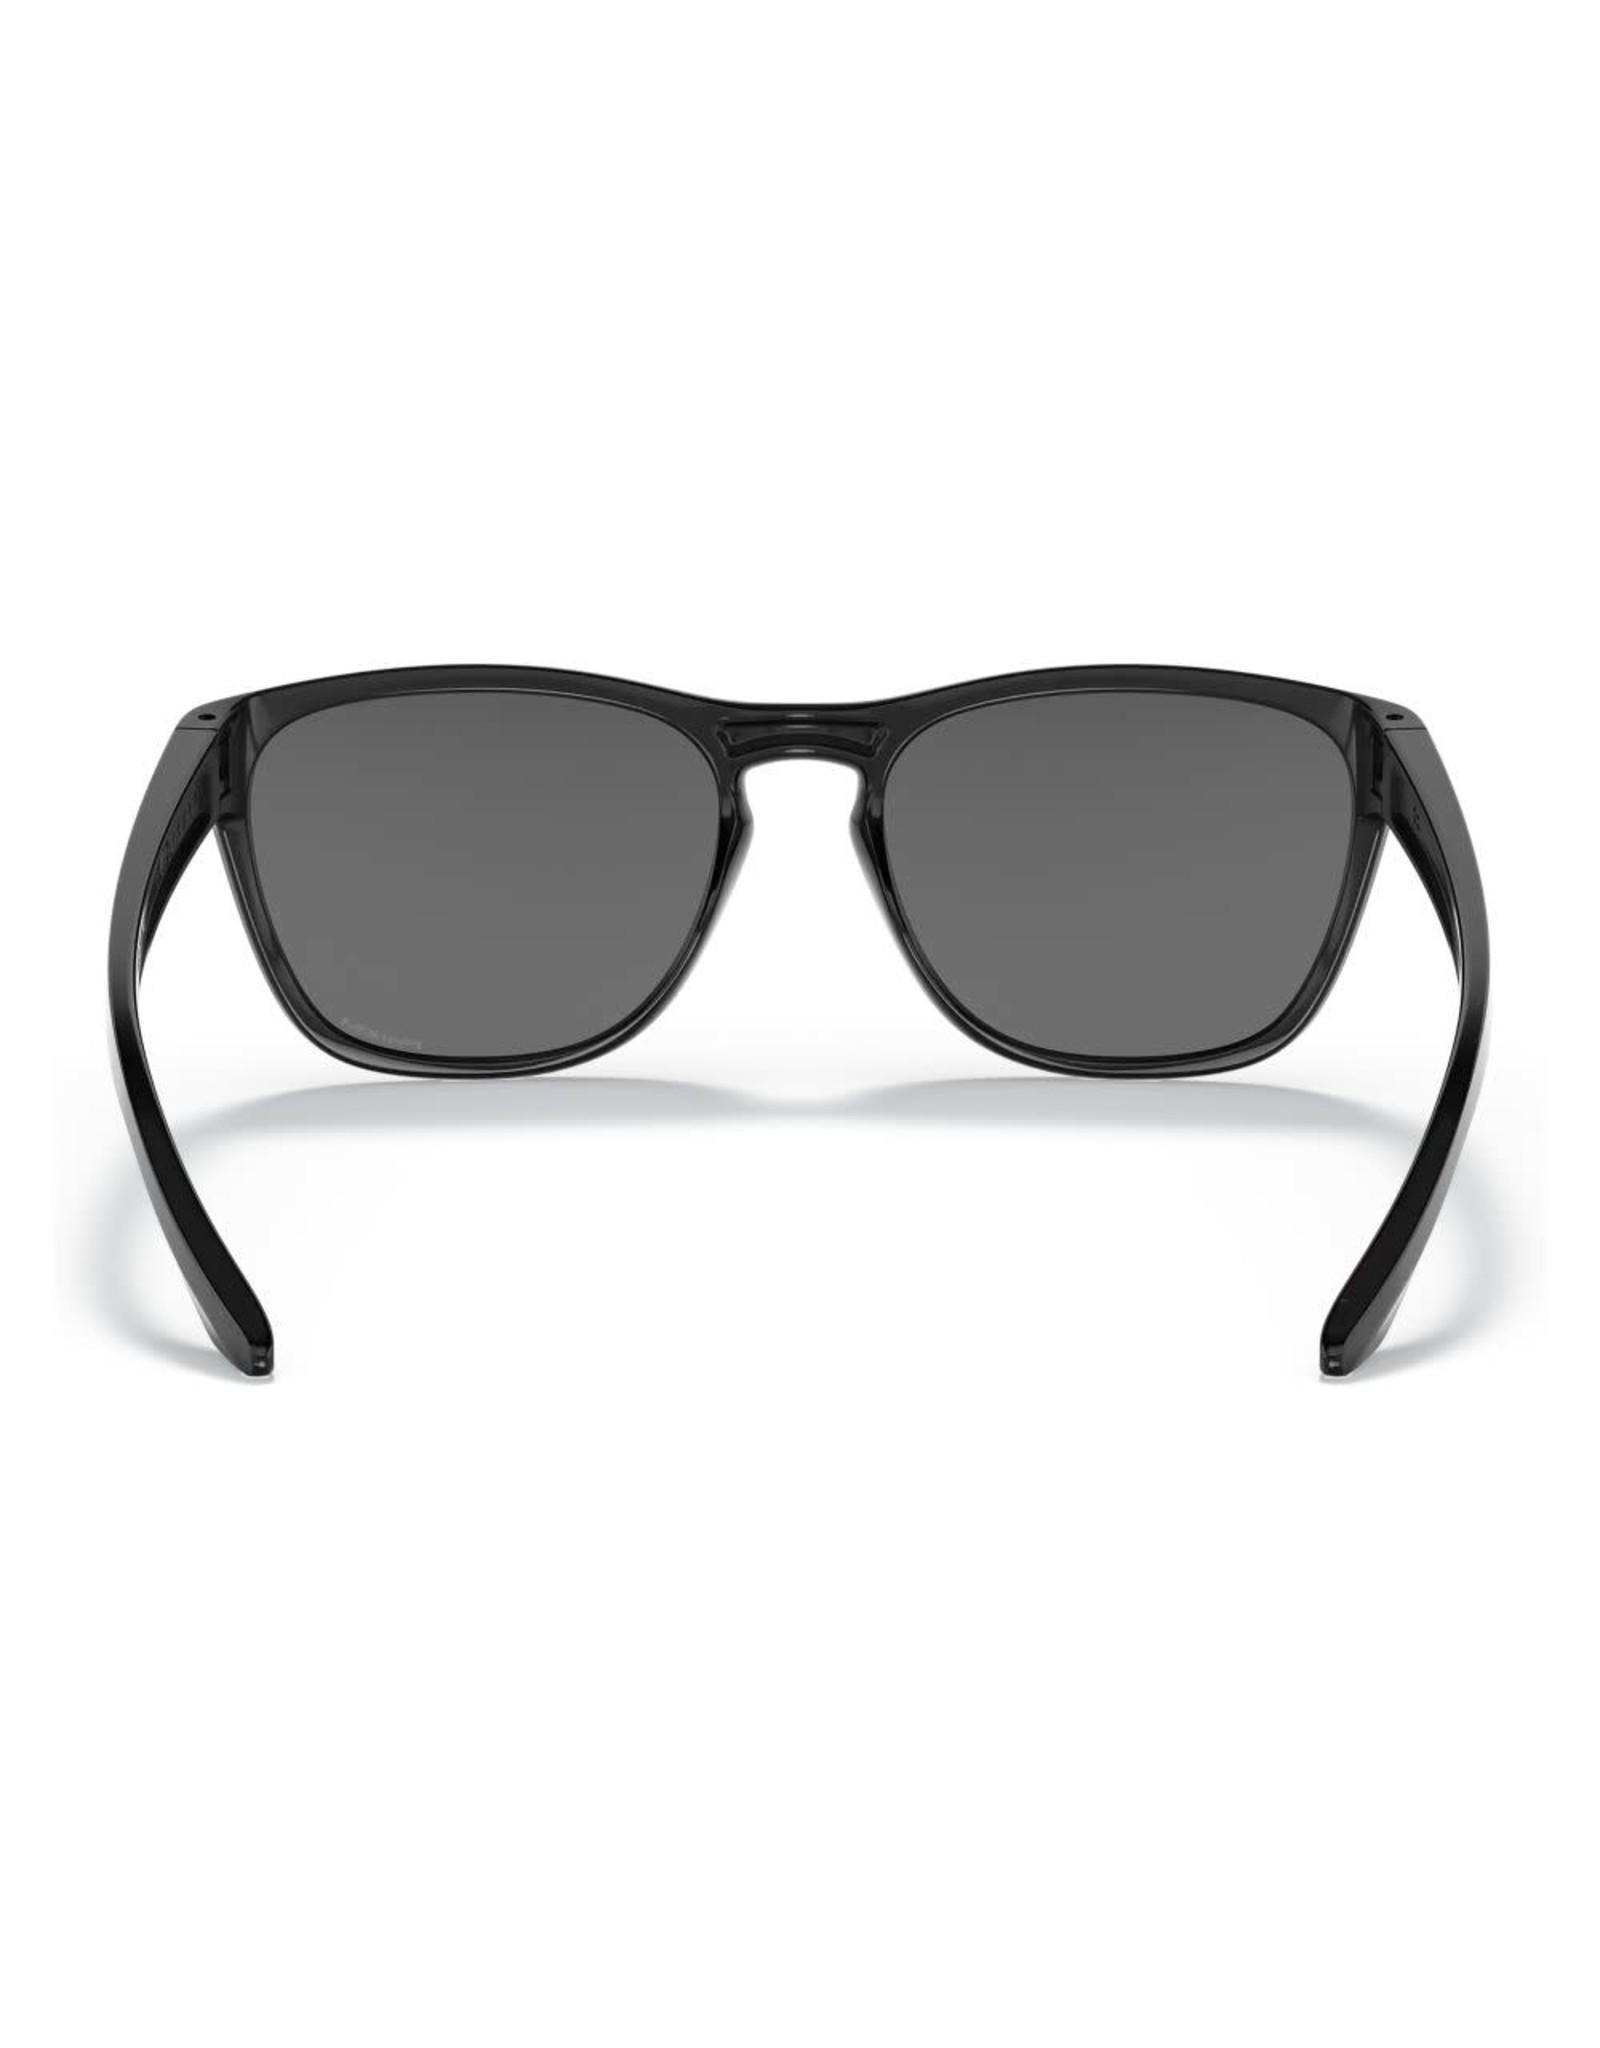 OAKLEY Oakley Manorburn black ink prizm black sunglasses